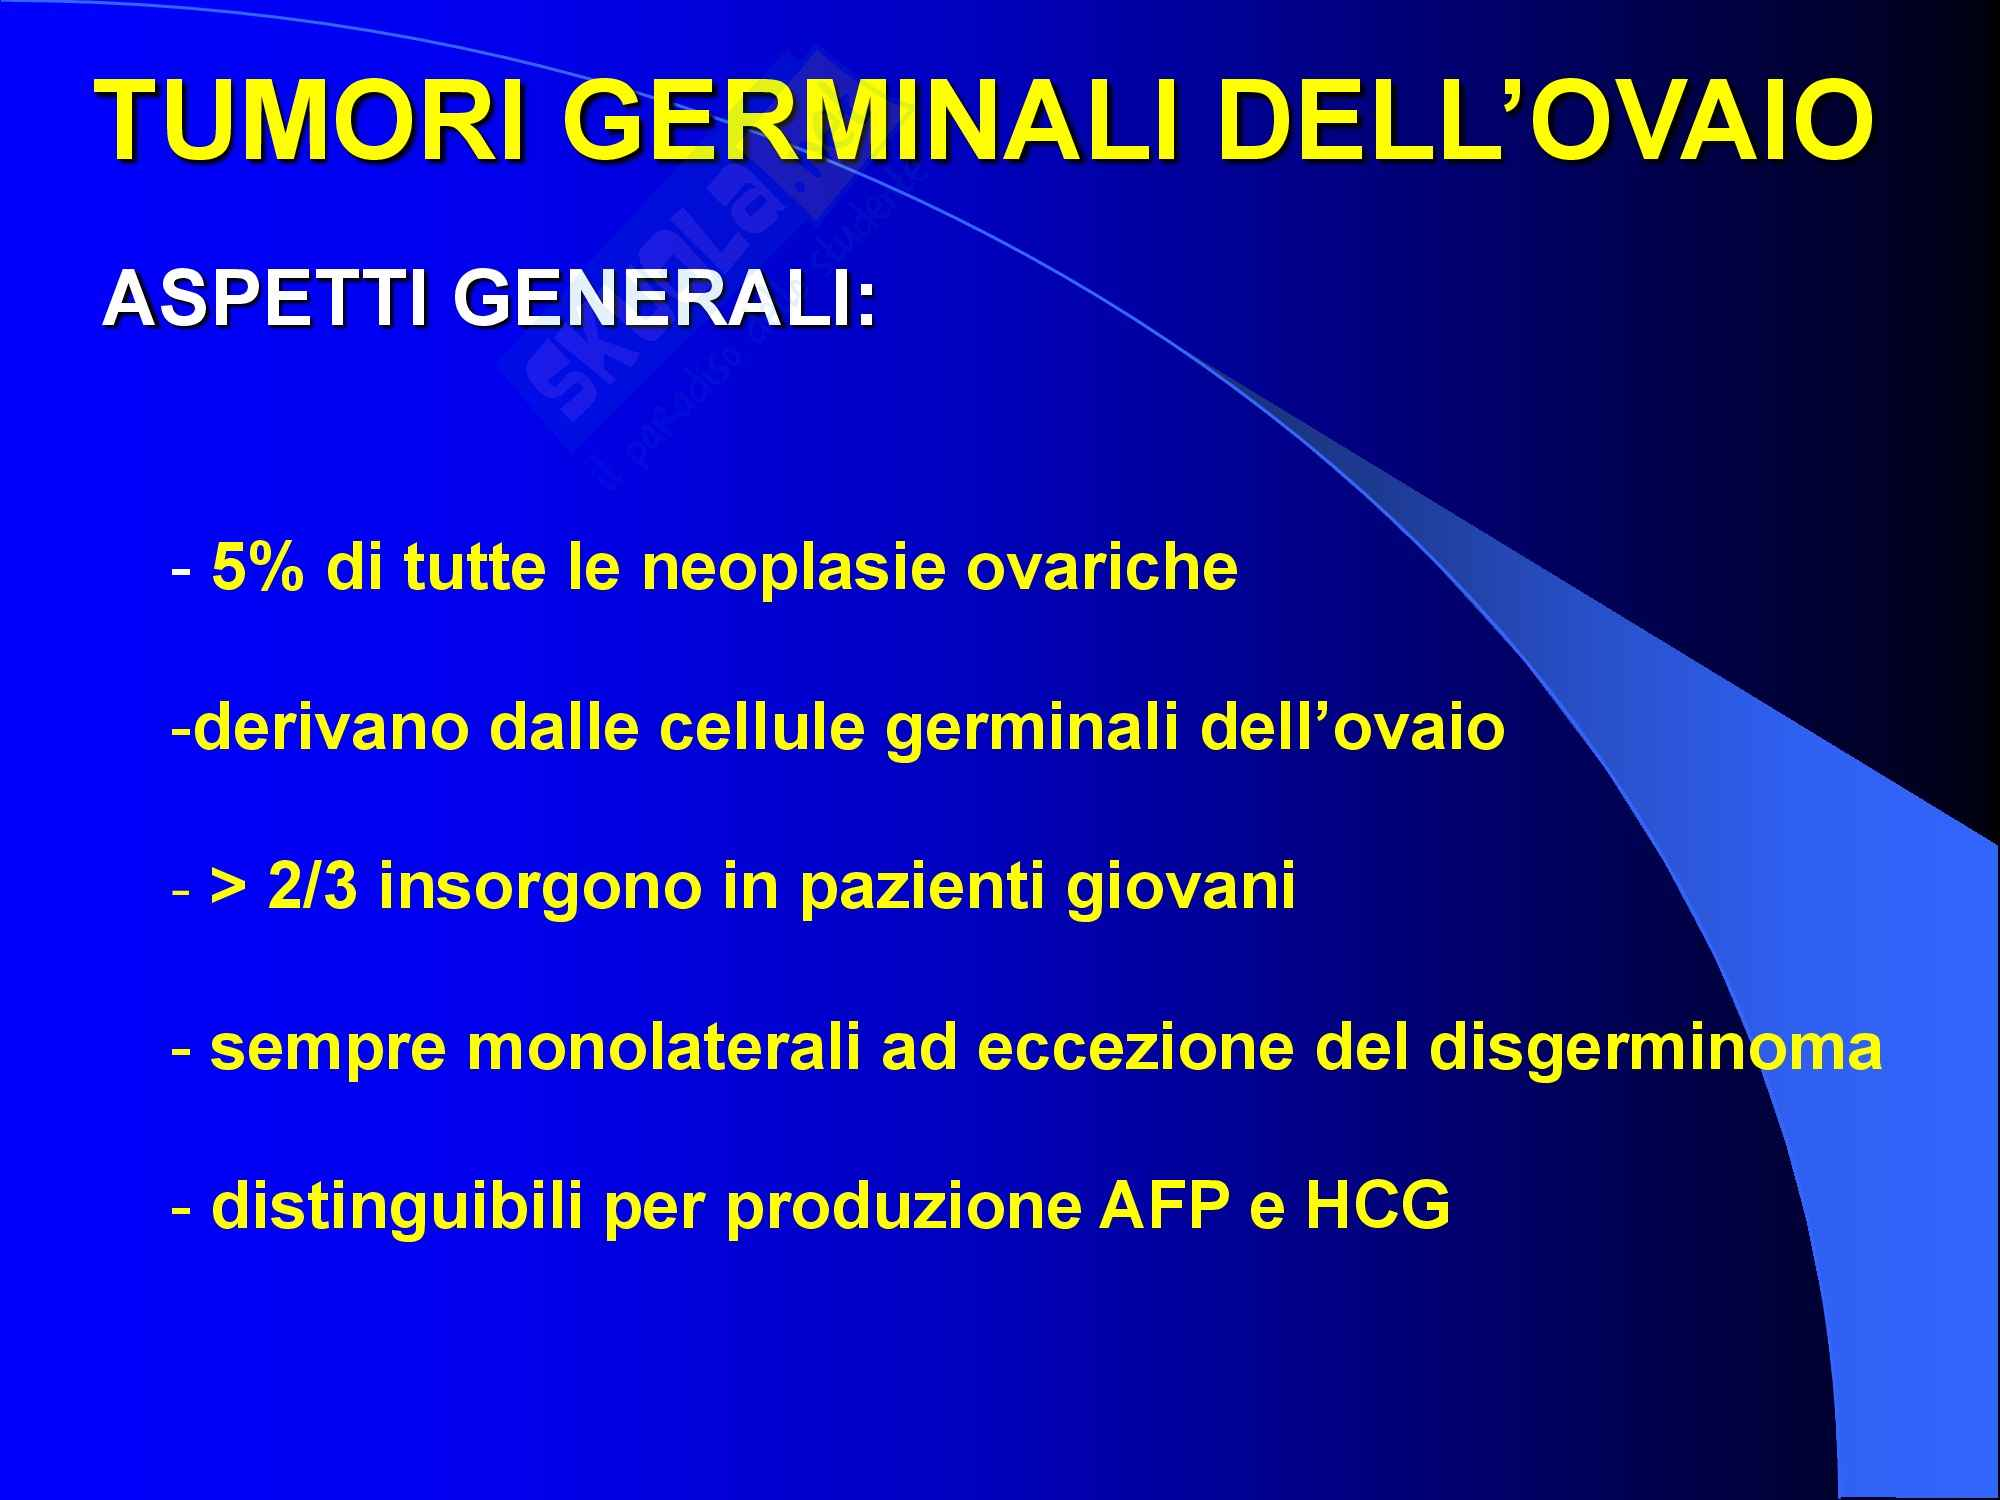 Ginecologia e Ostetricia - Neoplasie germinali ovariche Pag. 2